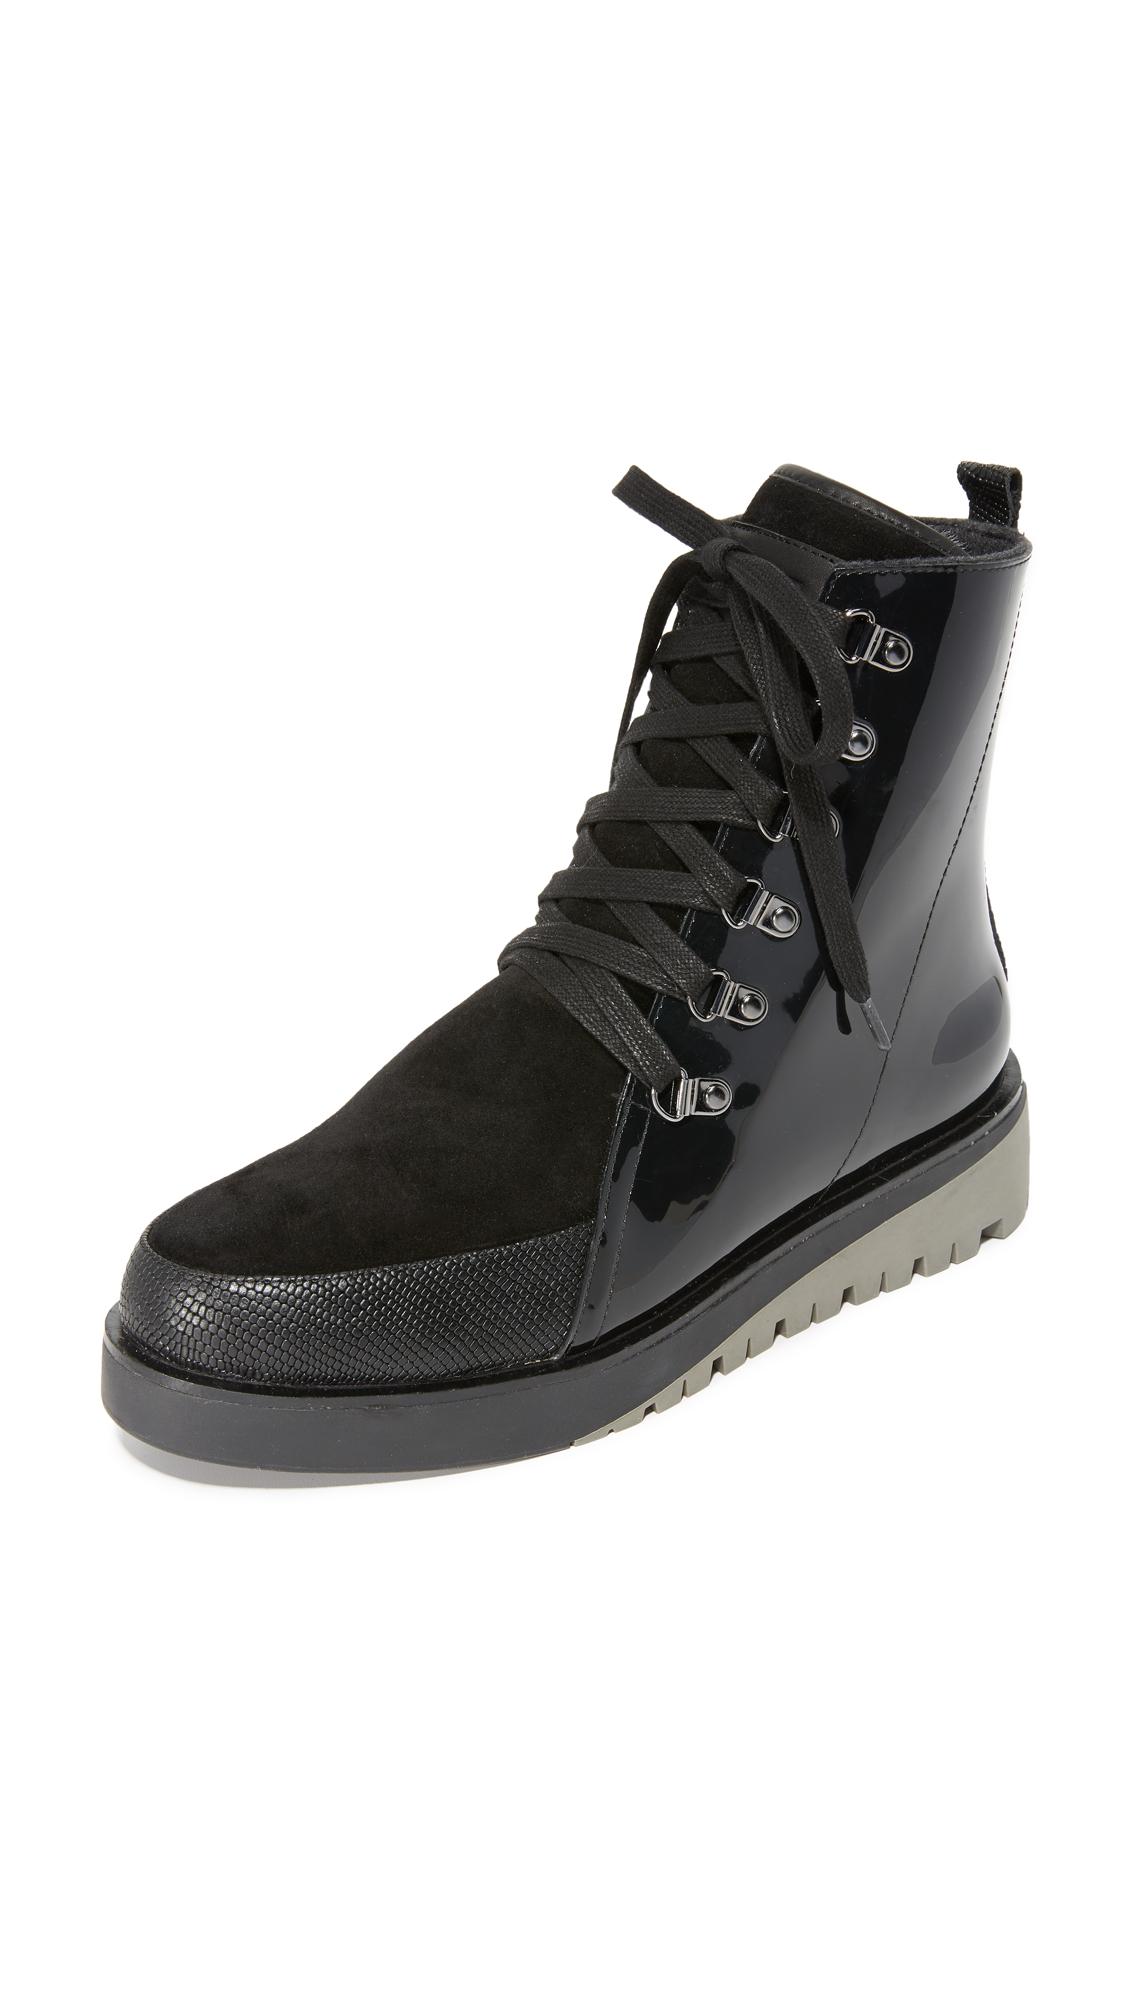 United Nude Hiker Combat Boots - Black